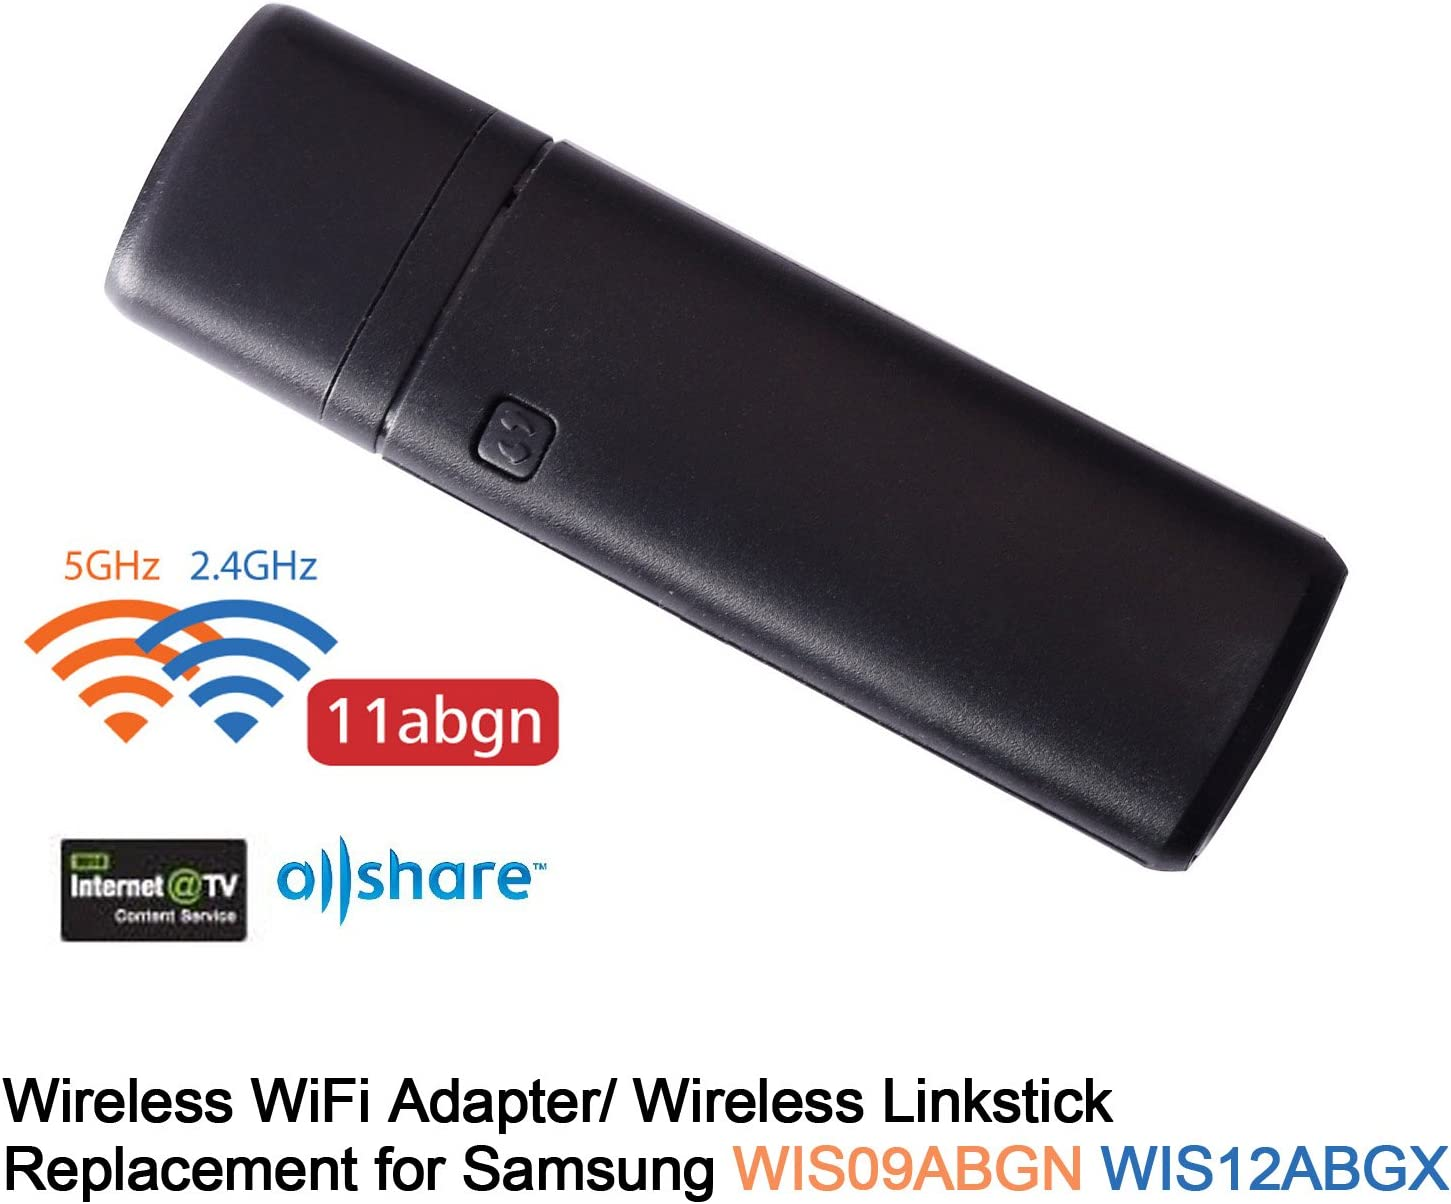 KR-NET - Adaptador de Red inalámbrico USB WiFi Dongle de Repuesto para Samsung Smart TV Linkstick WIS09ABGNX WIS12ABGNX: Amazon.es: Electrónica